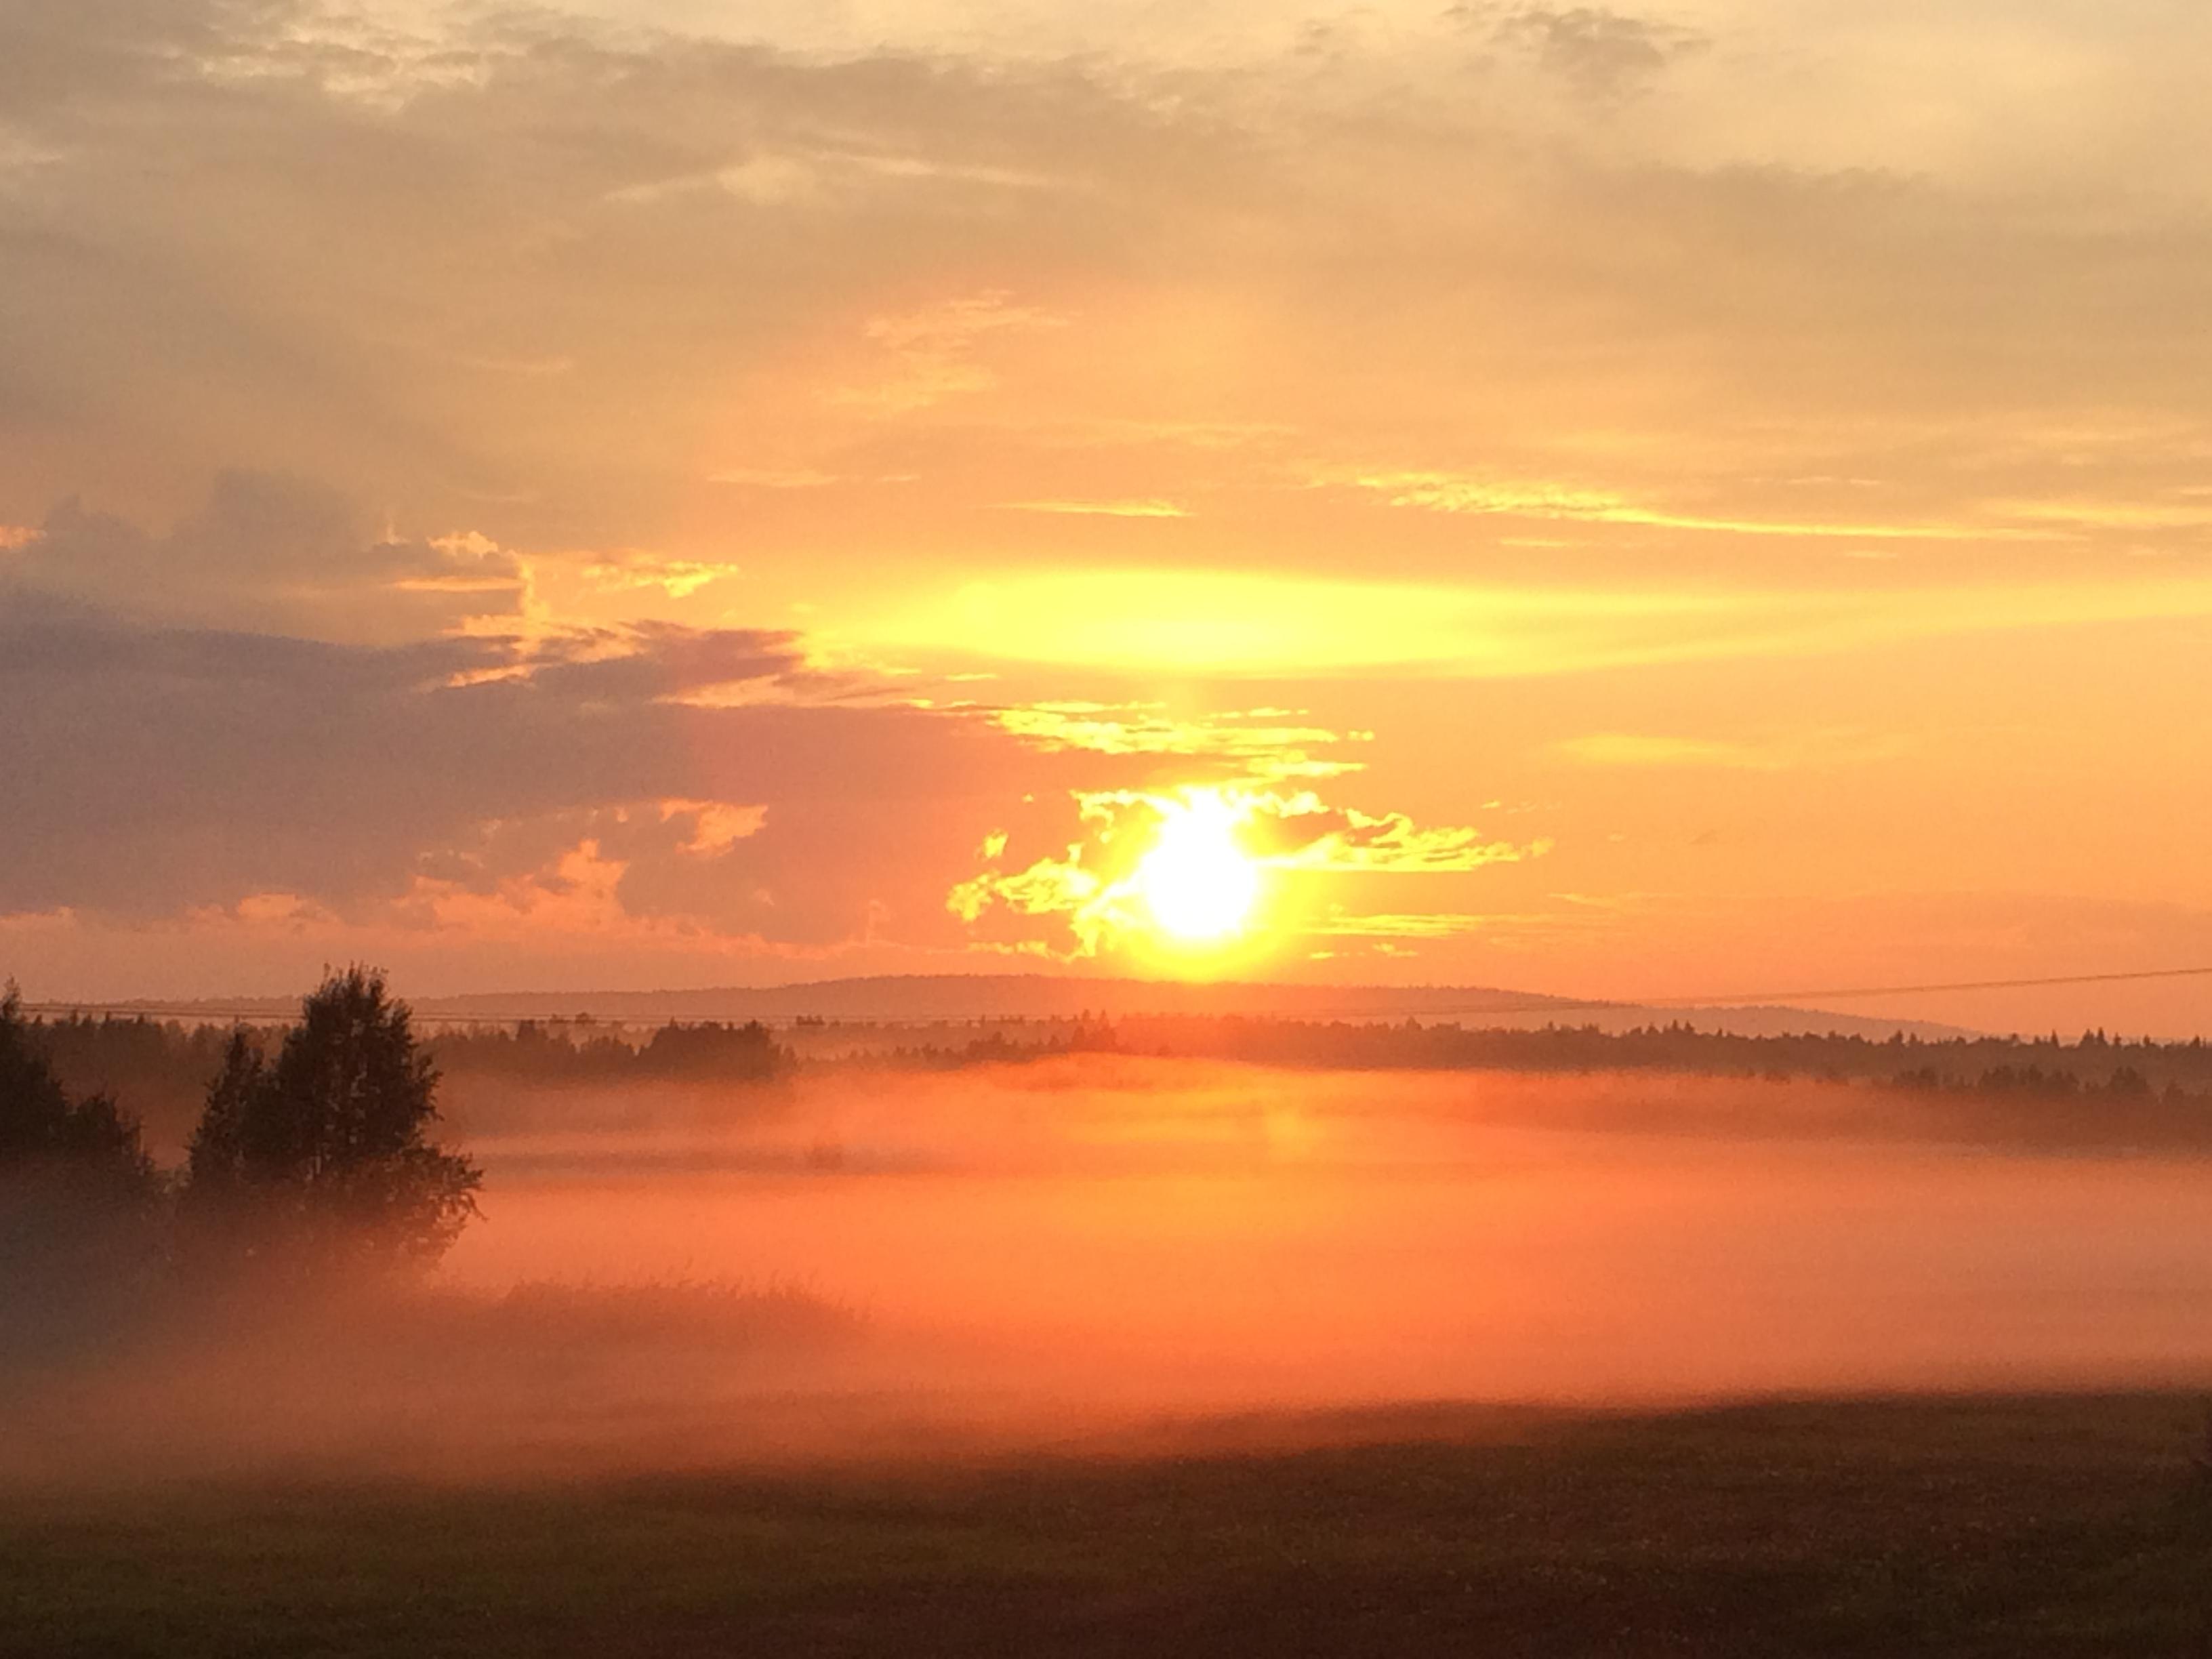 Solnedgång dimma